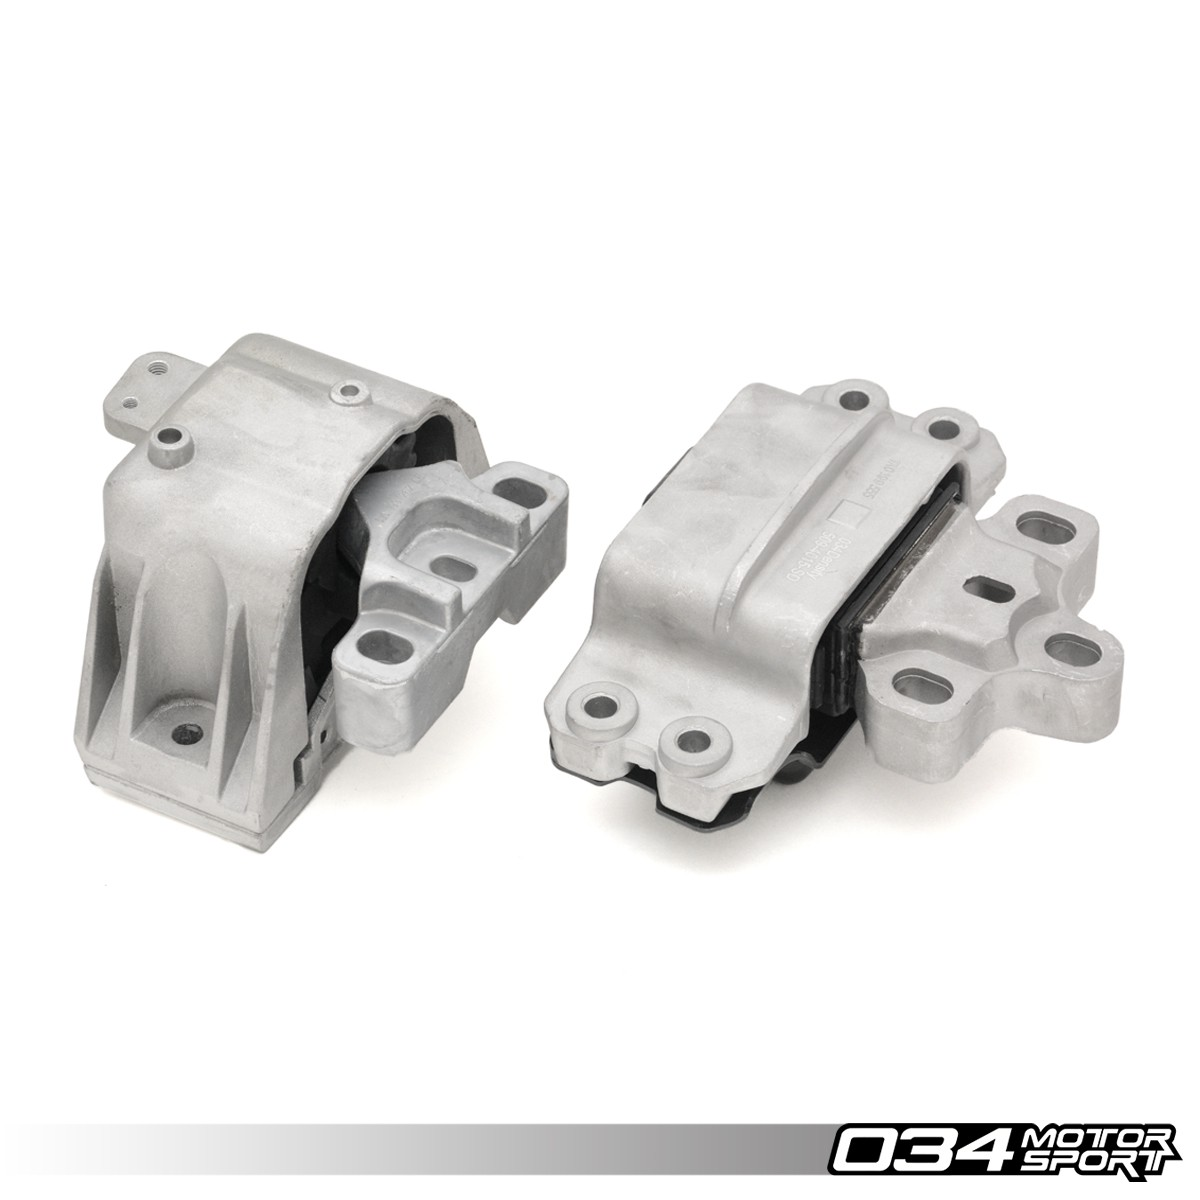 Motor Mount Pair, Density Line, MkV Volkswagen R32/Eos, 8J/8P Audi TT/A3, 3.2L VR6 | 034-509-5004